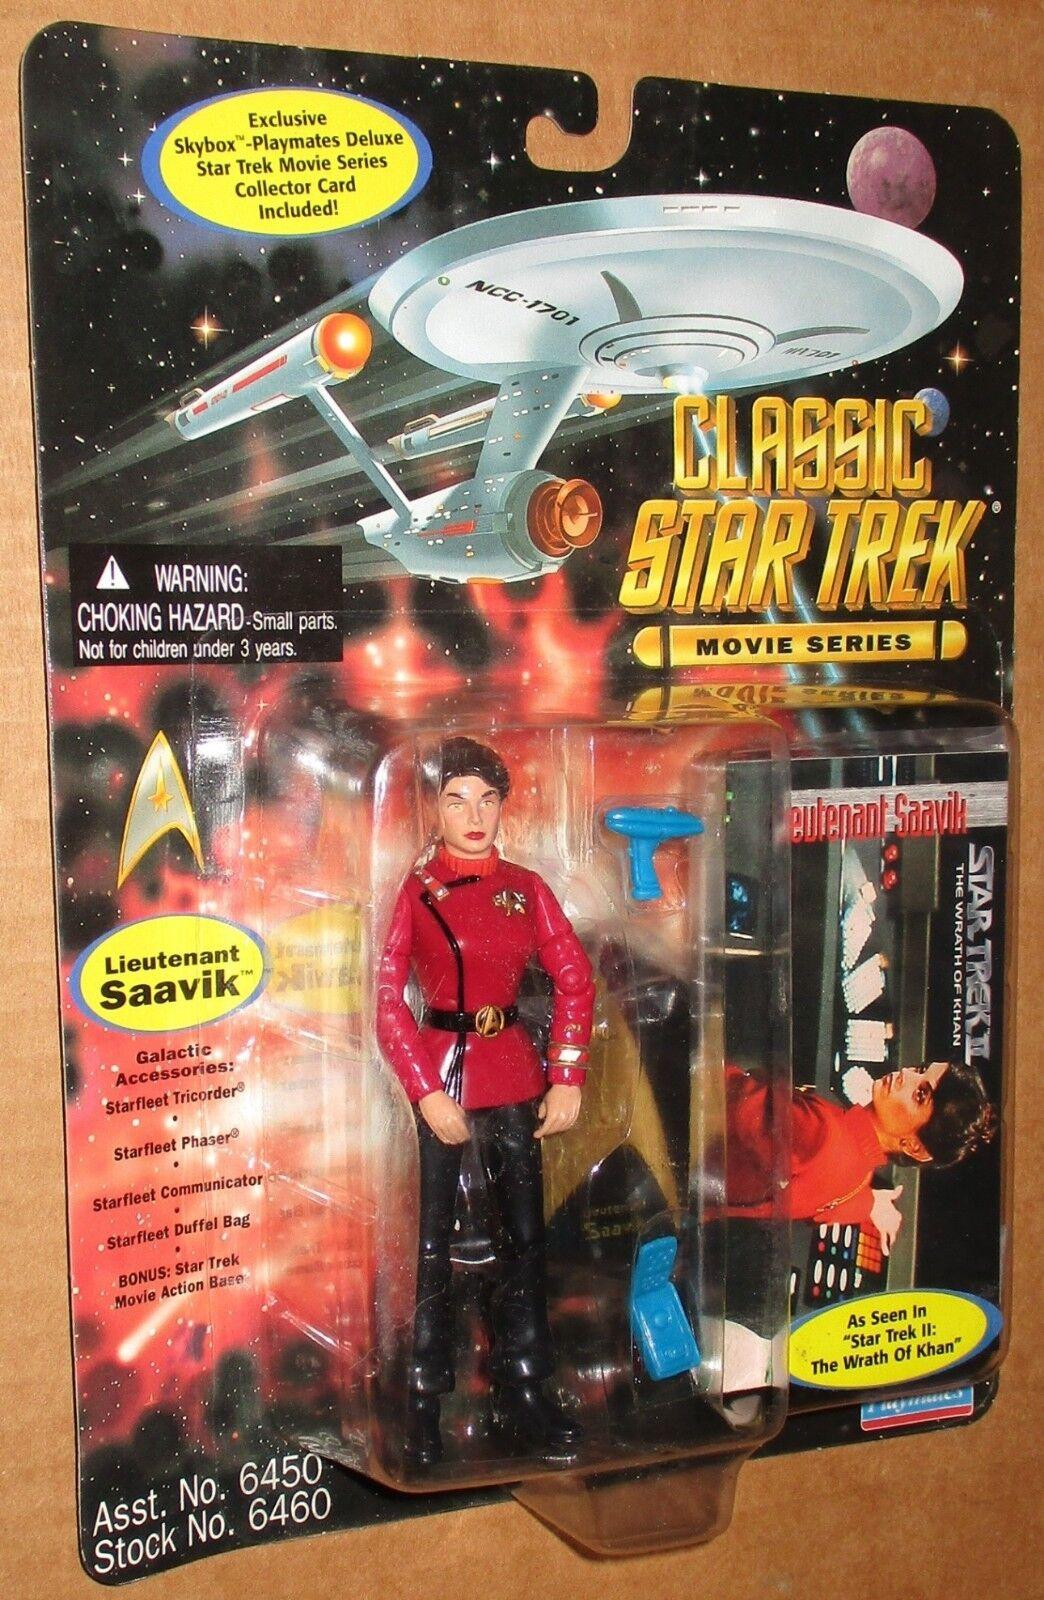 000003 Classic Star Trek Low Number Saavik Figure MOC 1995 Playmates Employee